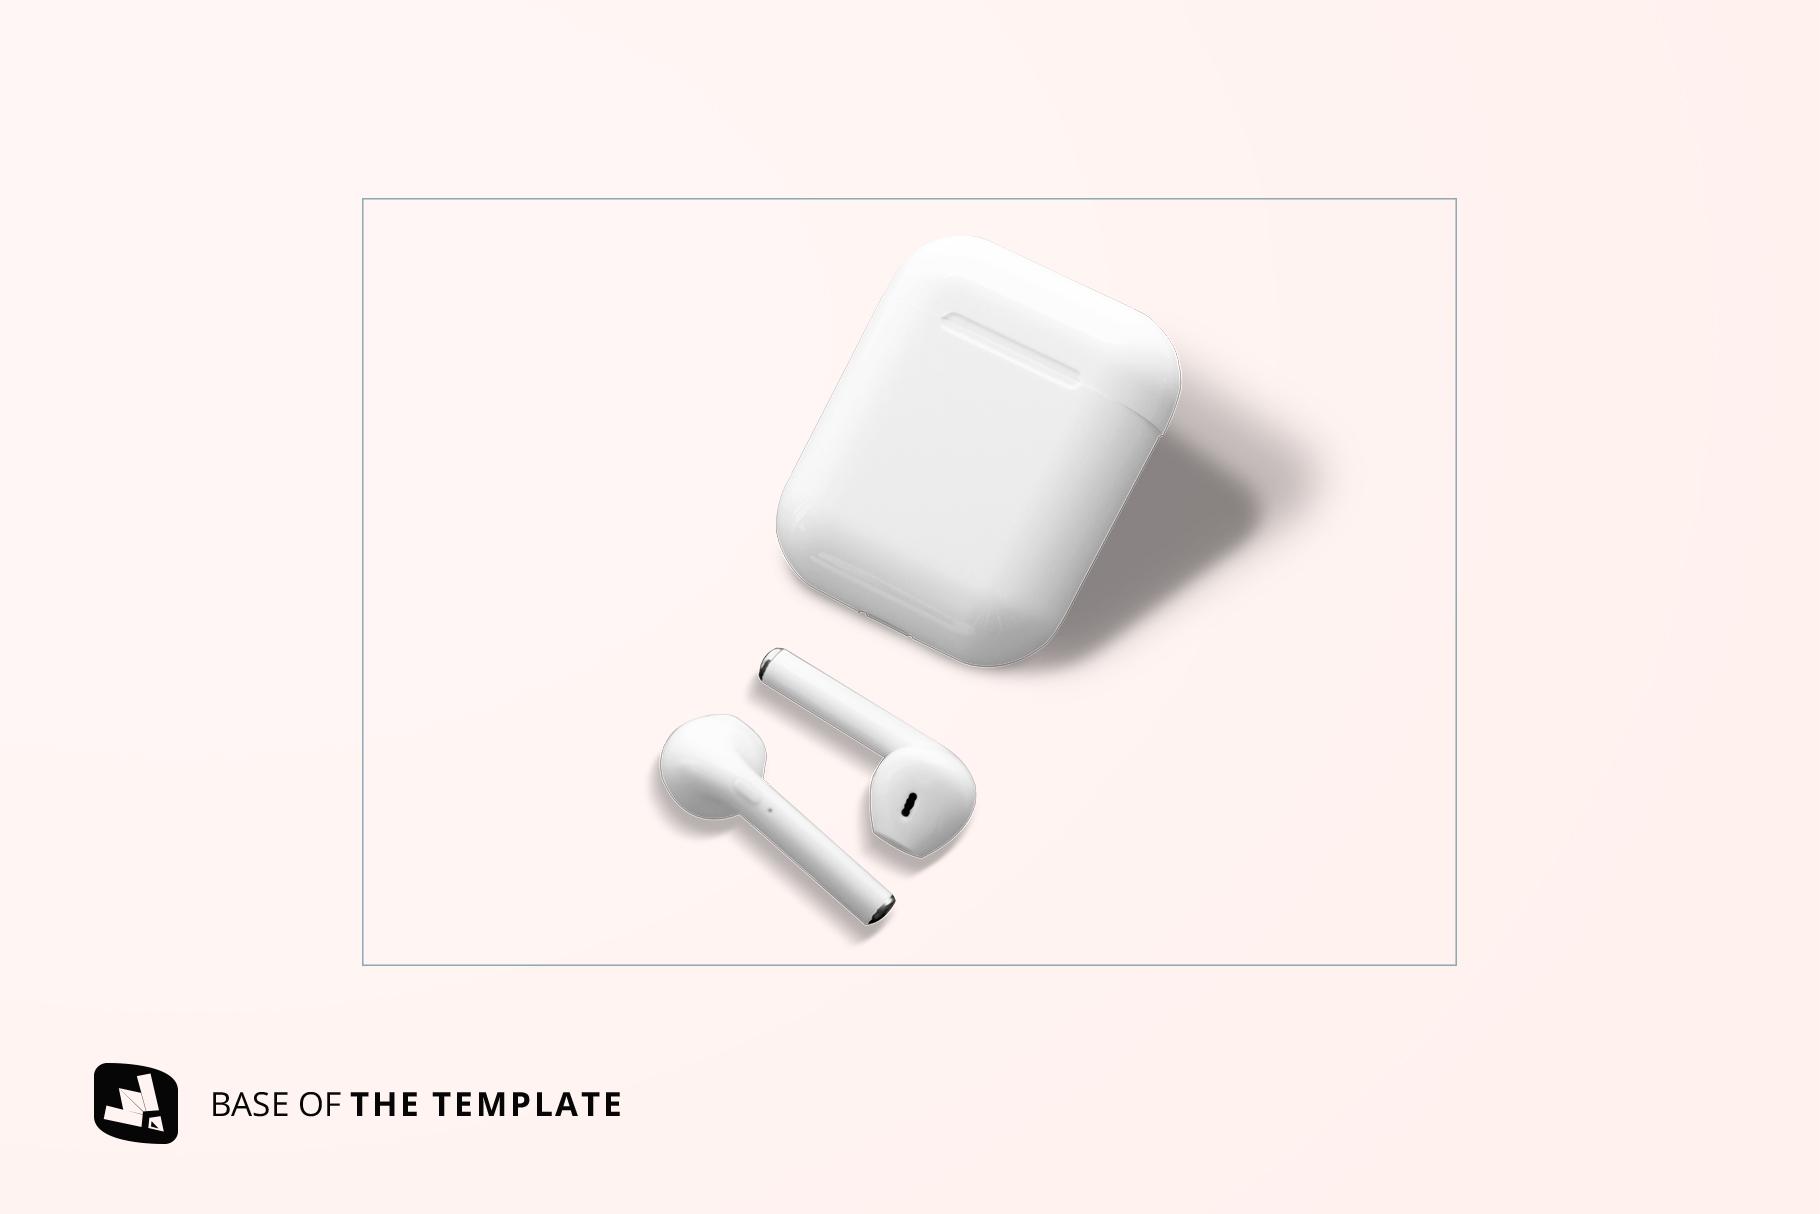 base image of the airpod case mockup